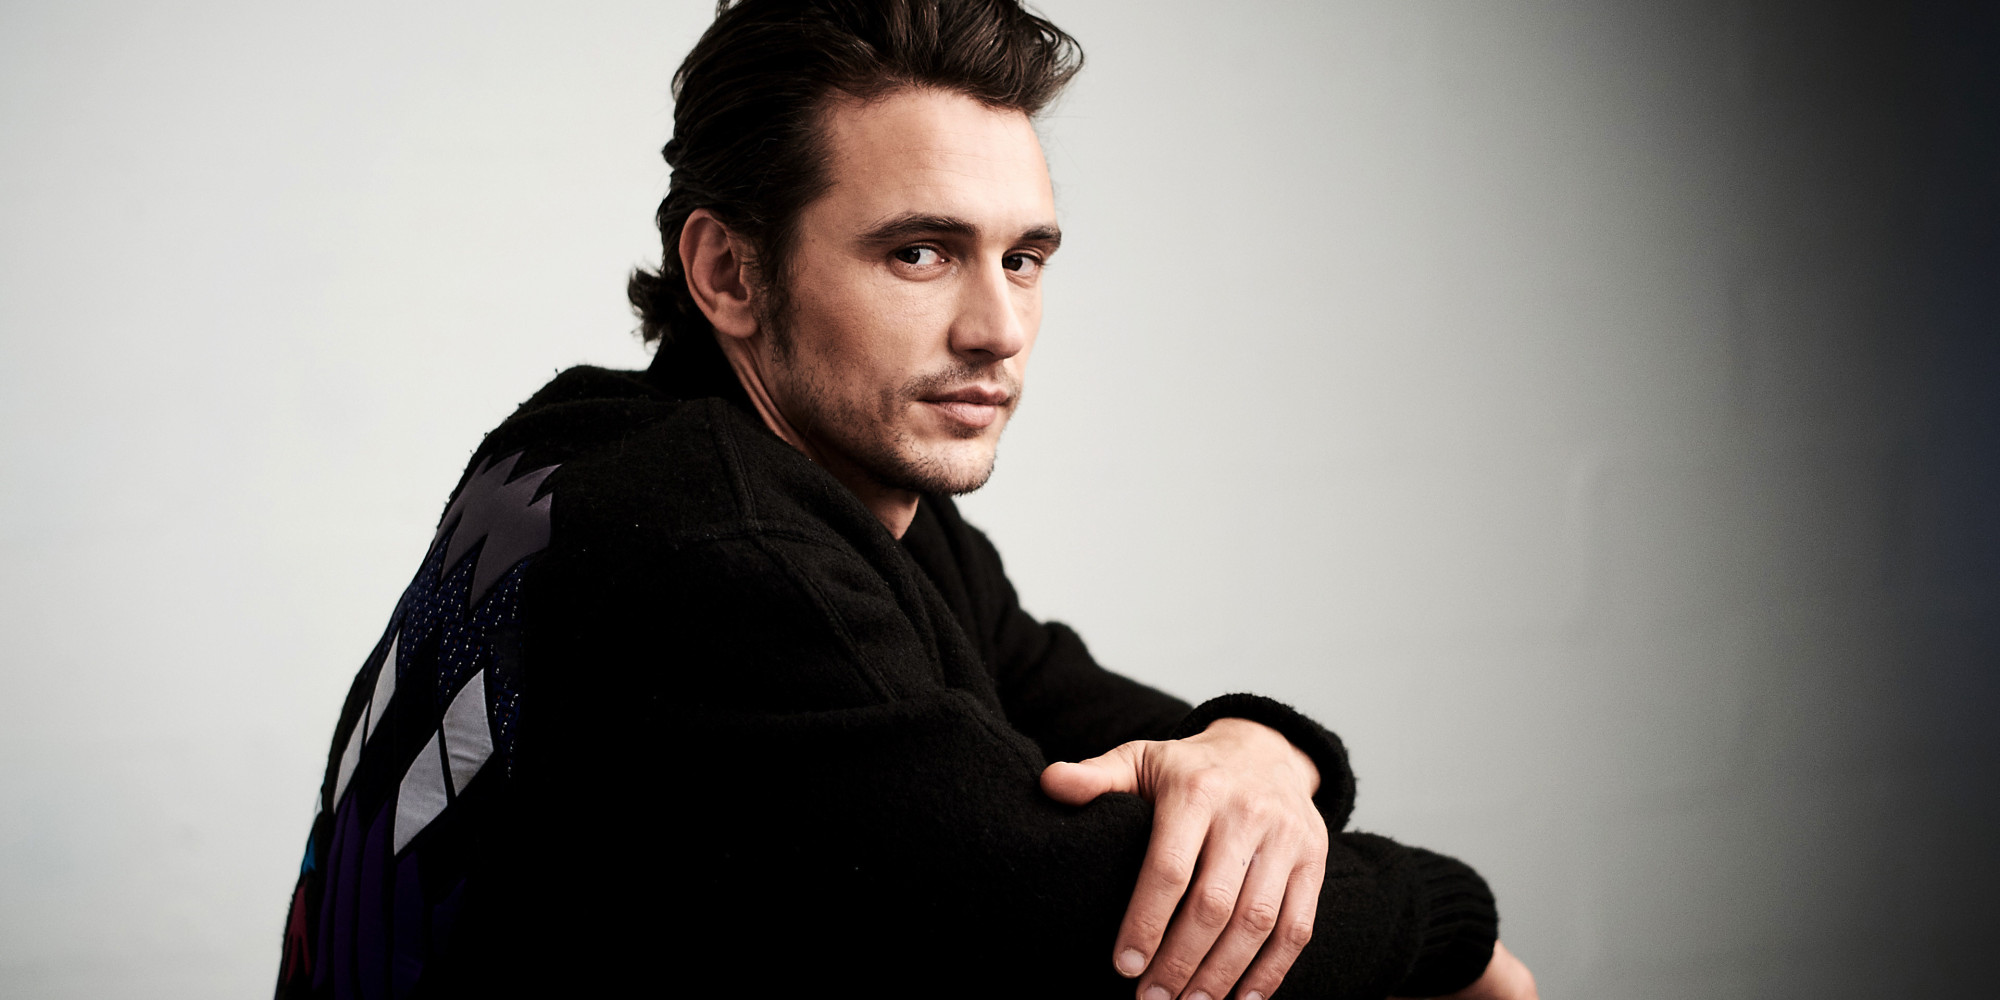 NEW YORK, NY - APRIL 16: Actor James Franco from